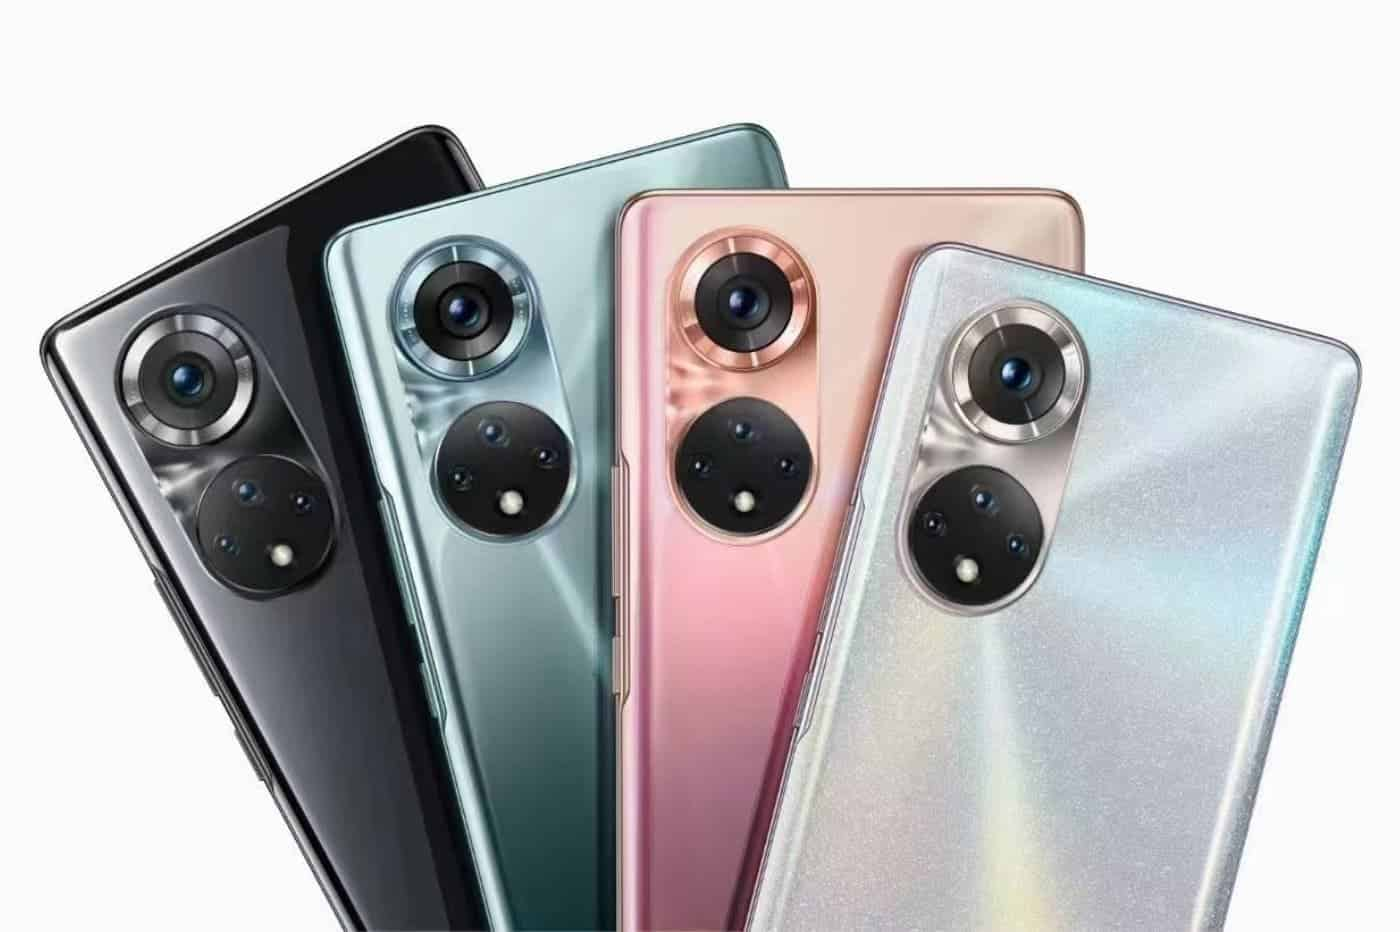 Honor готовит два смартфона с процессорами Dimensity 700 и 1200 (honor 50)